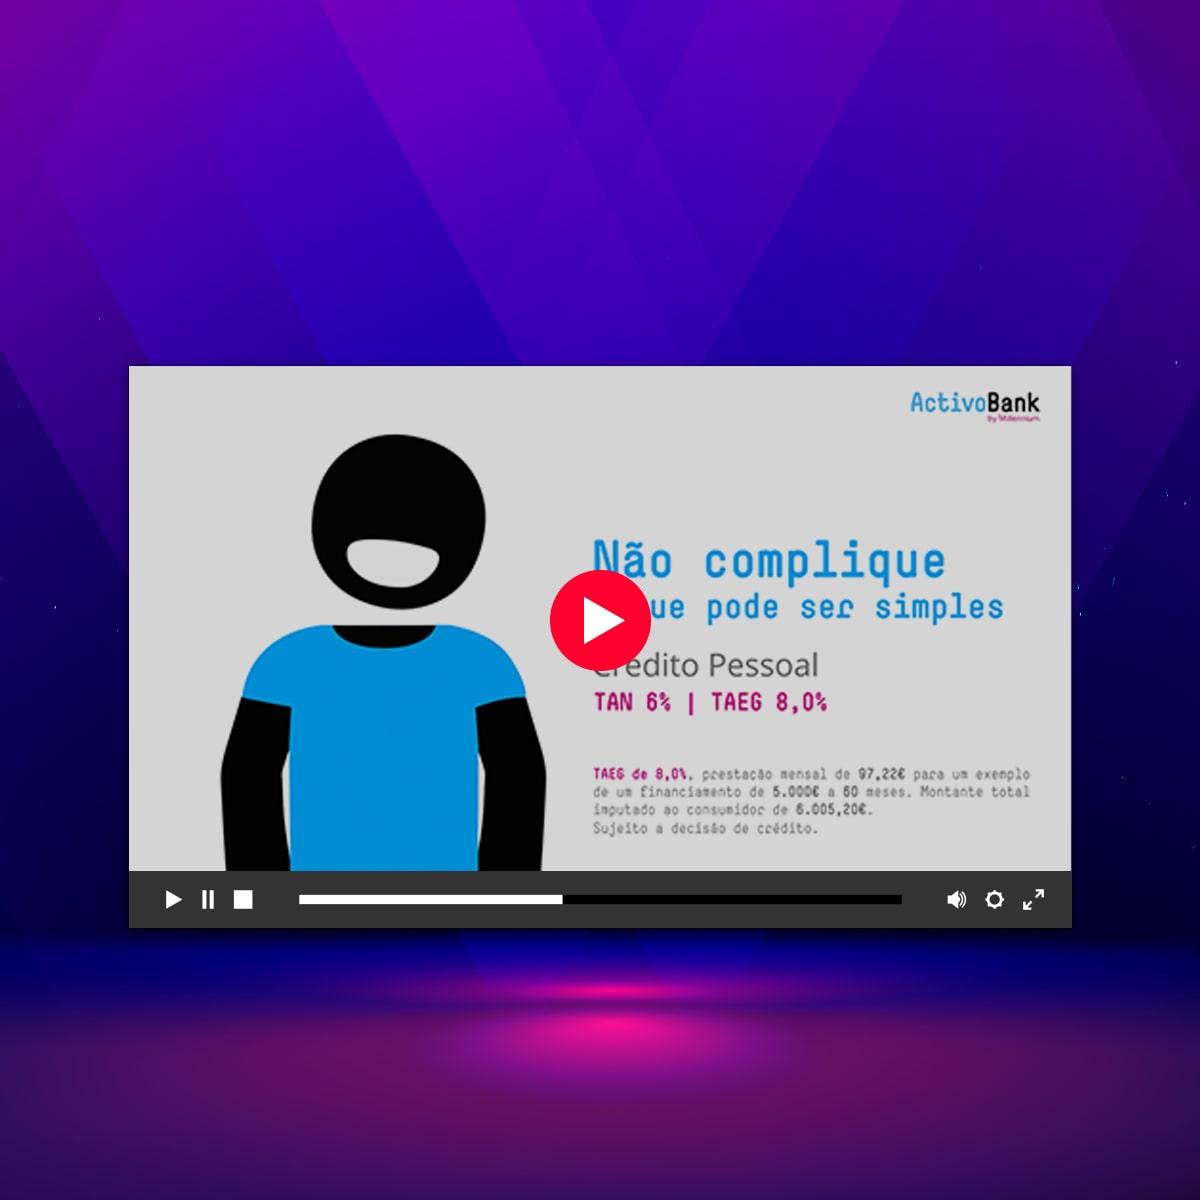 Video ActivoBank